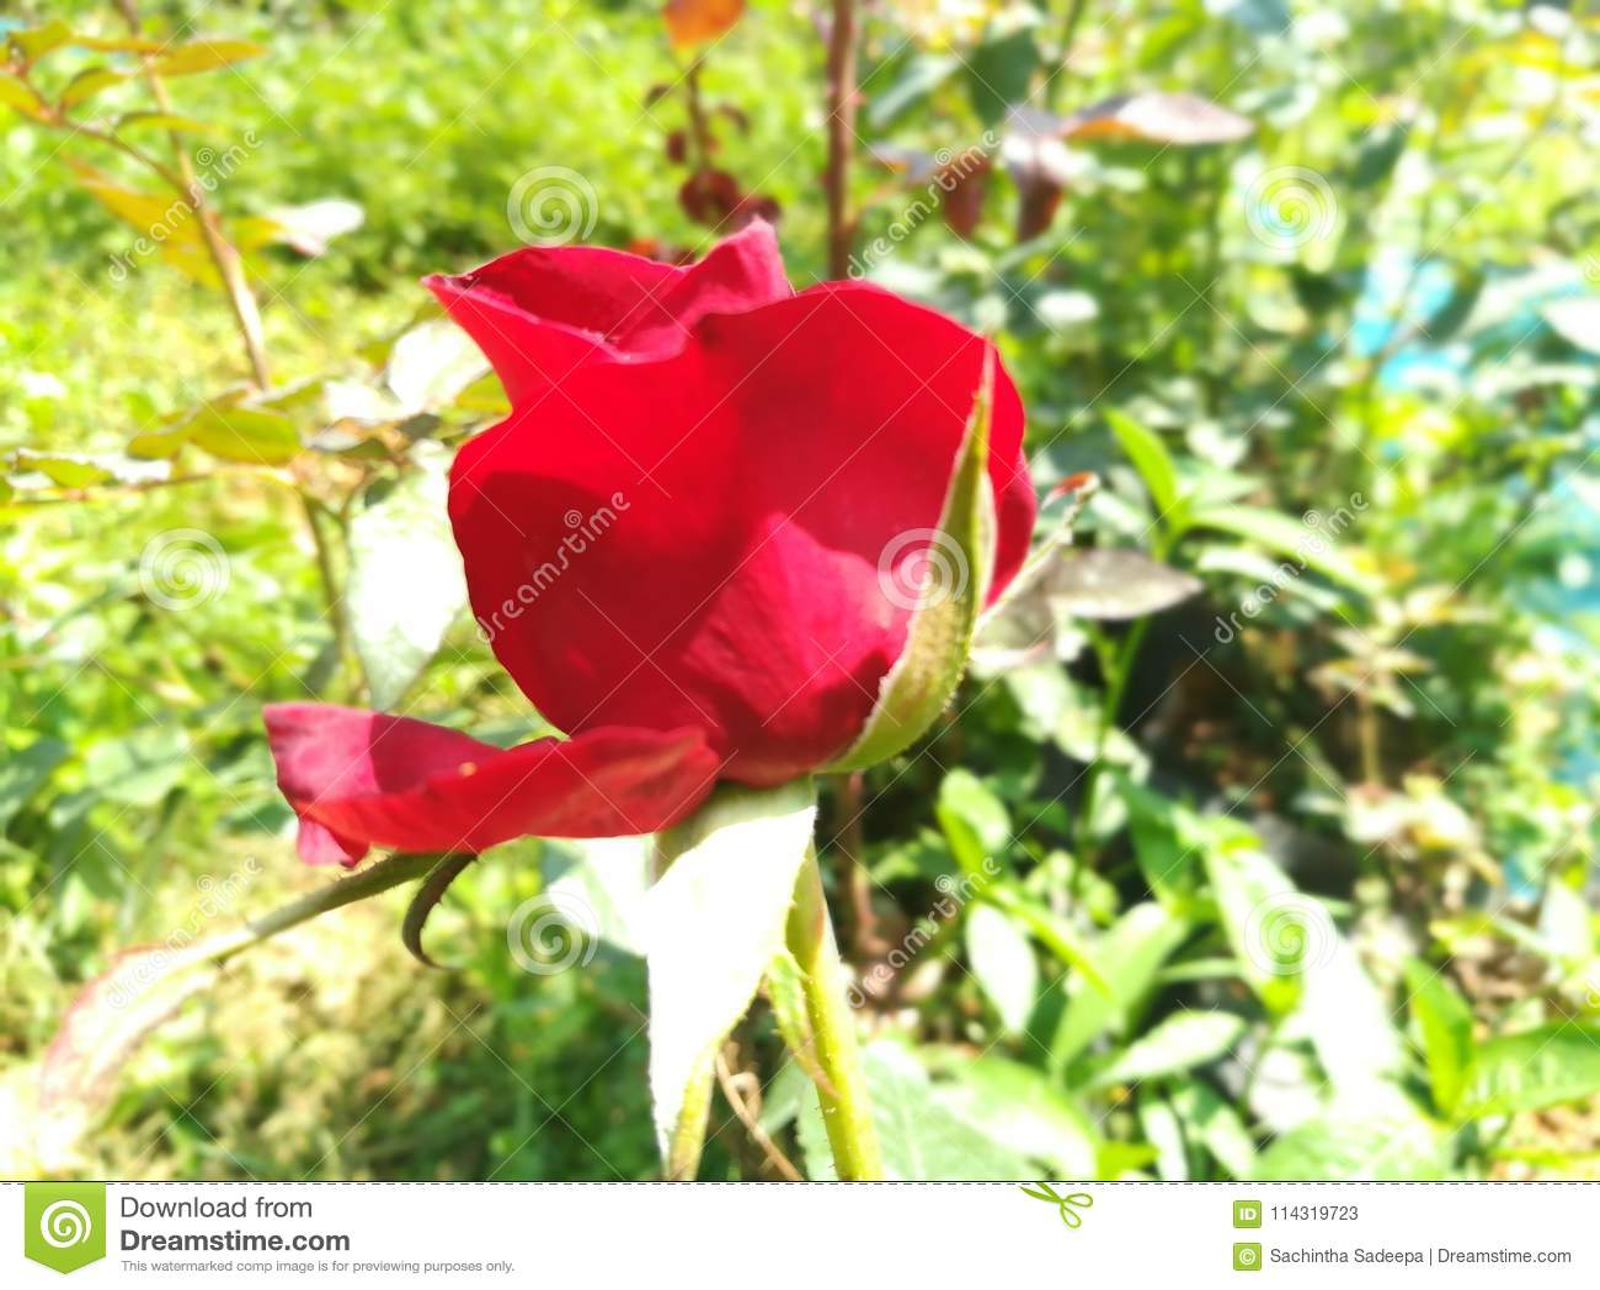 World most beautiful flowers stock image image of beautiful world this image is world most beautiful flowers izmirmasajfo